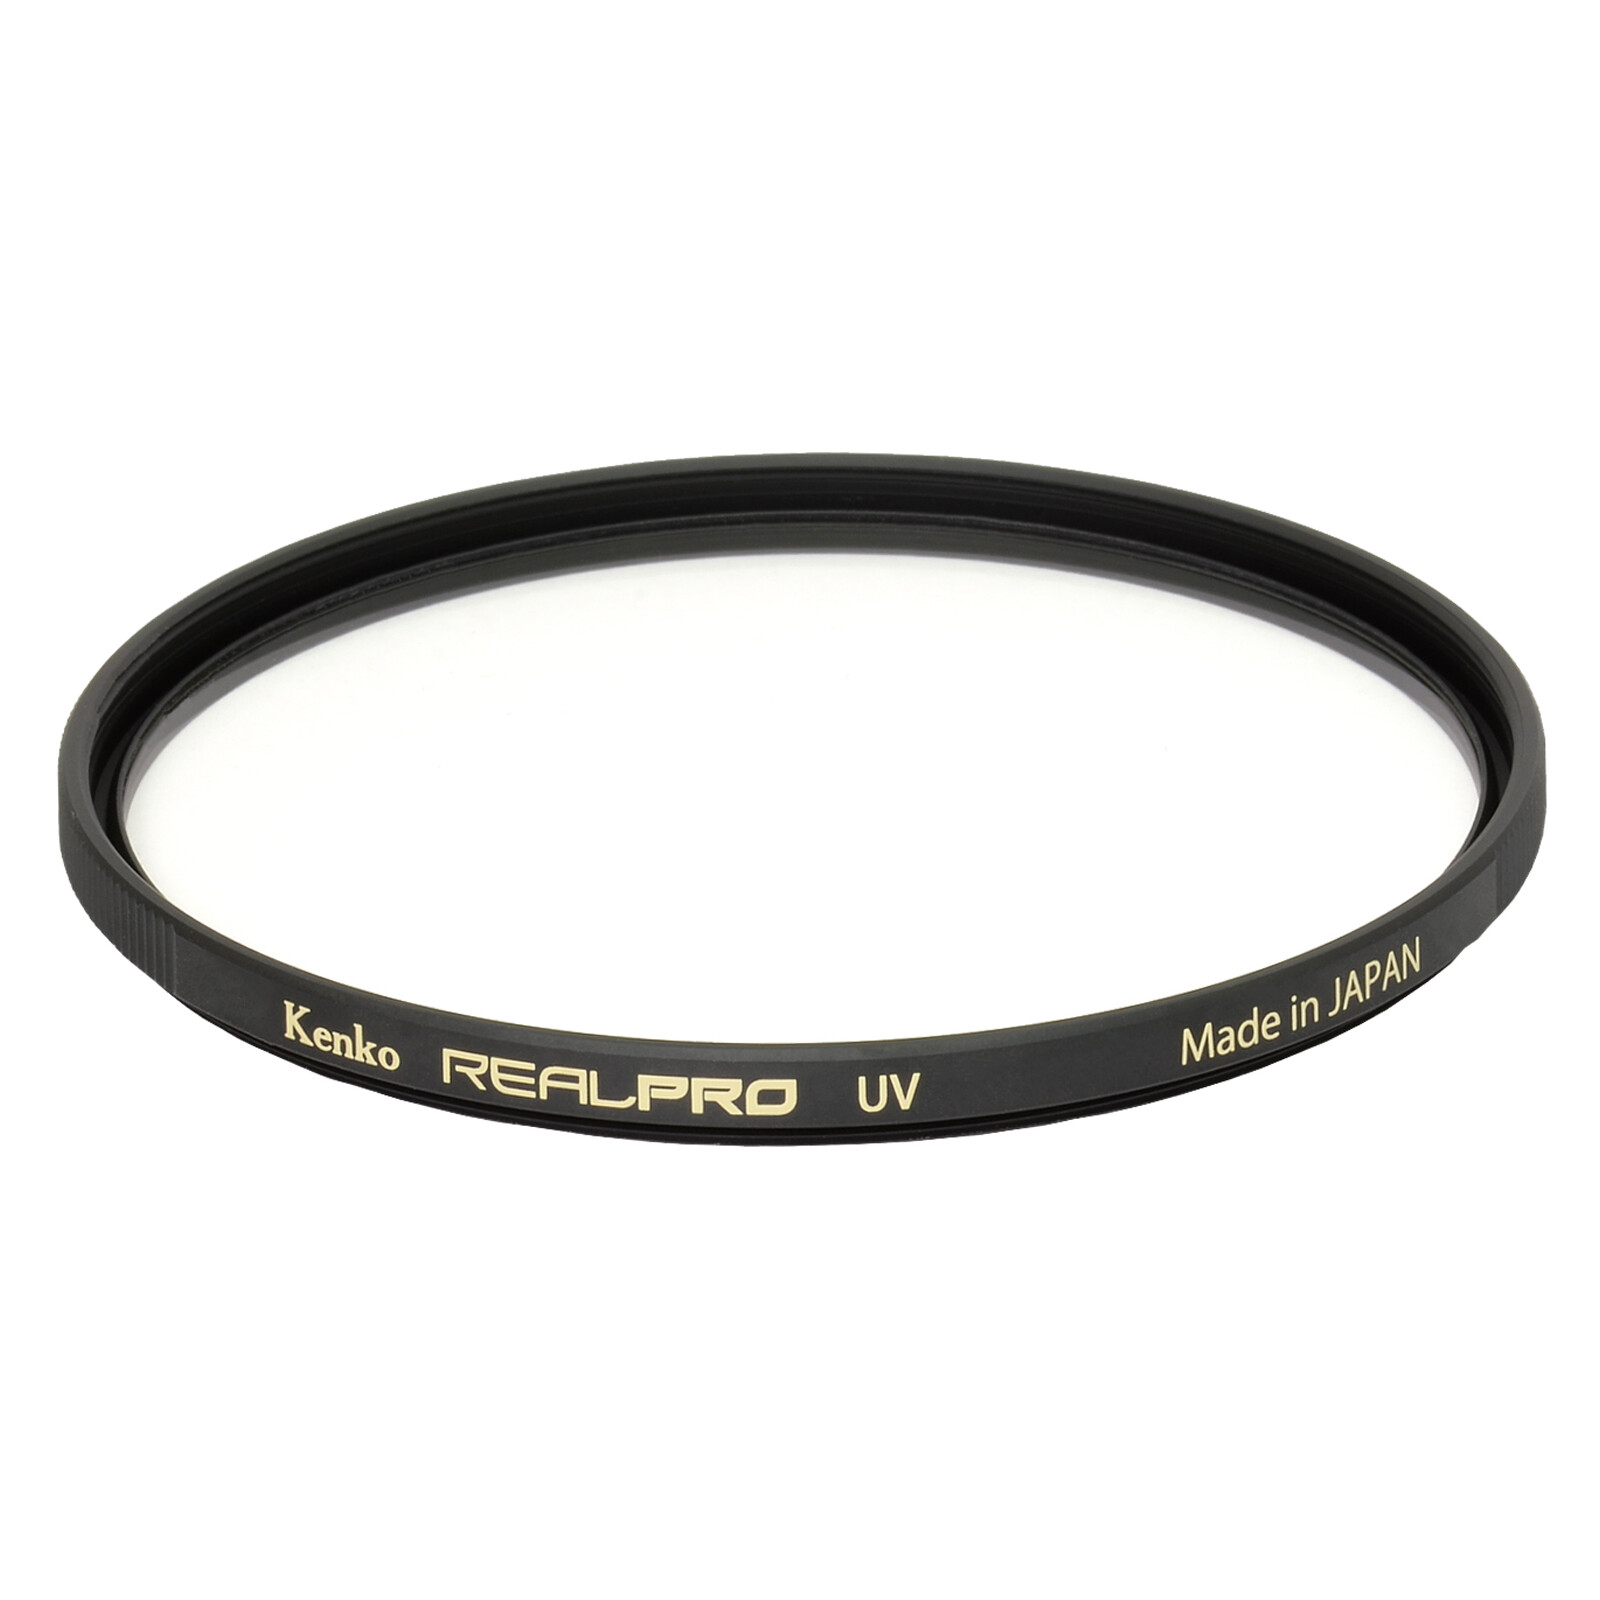 Kenko Real Pro UV 46mm Slim